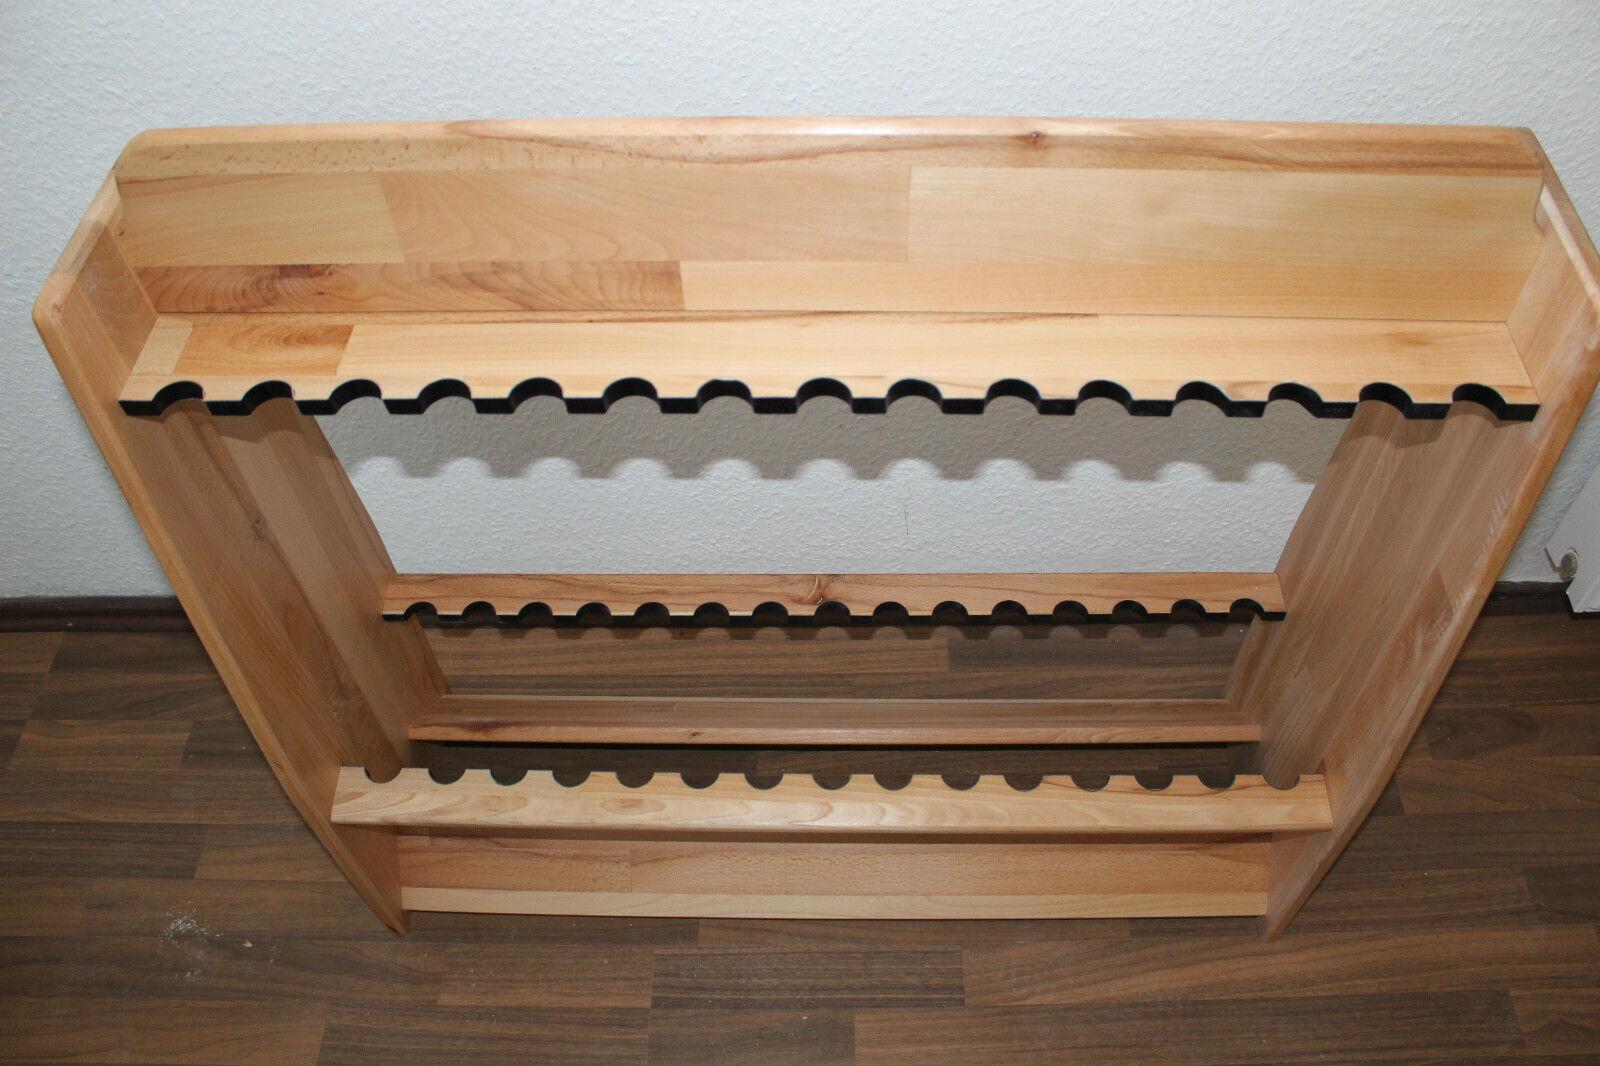 rutenst nder aus massiv holz buche f r 30 ruten eur 59. Black Bedroom Furniture Sets. Home Design Ideas